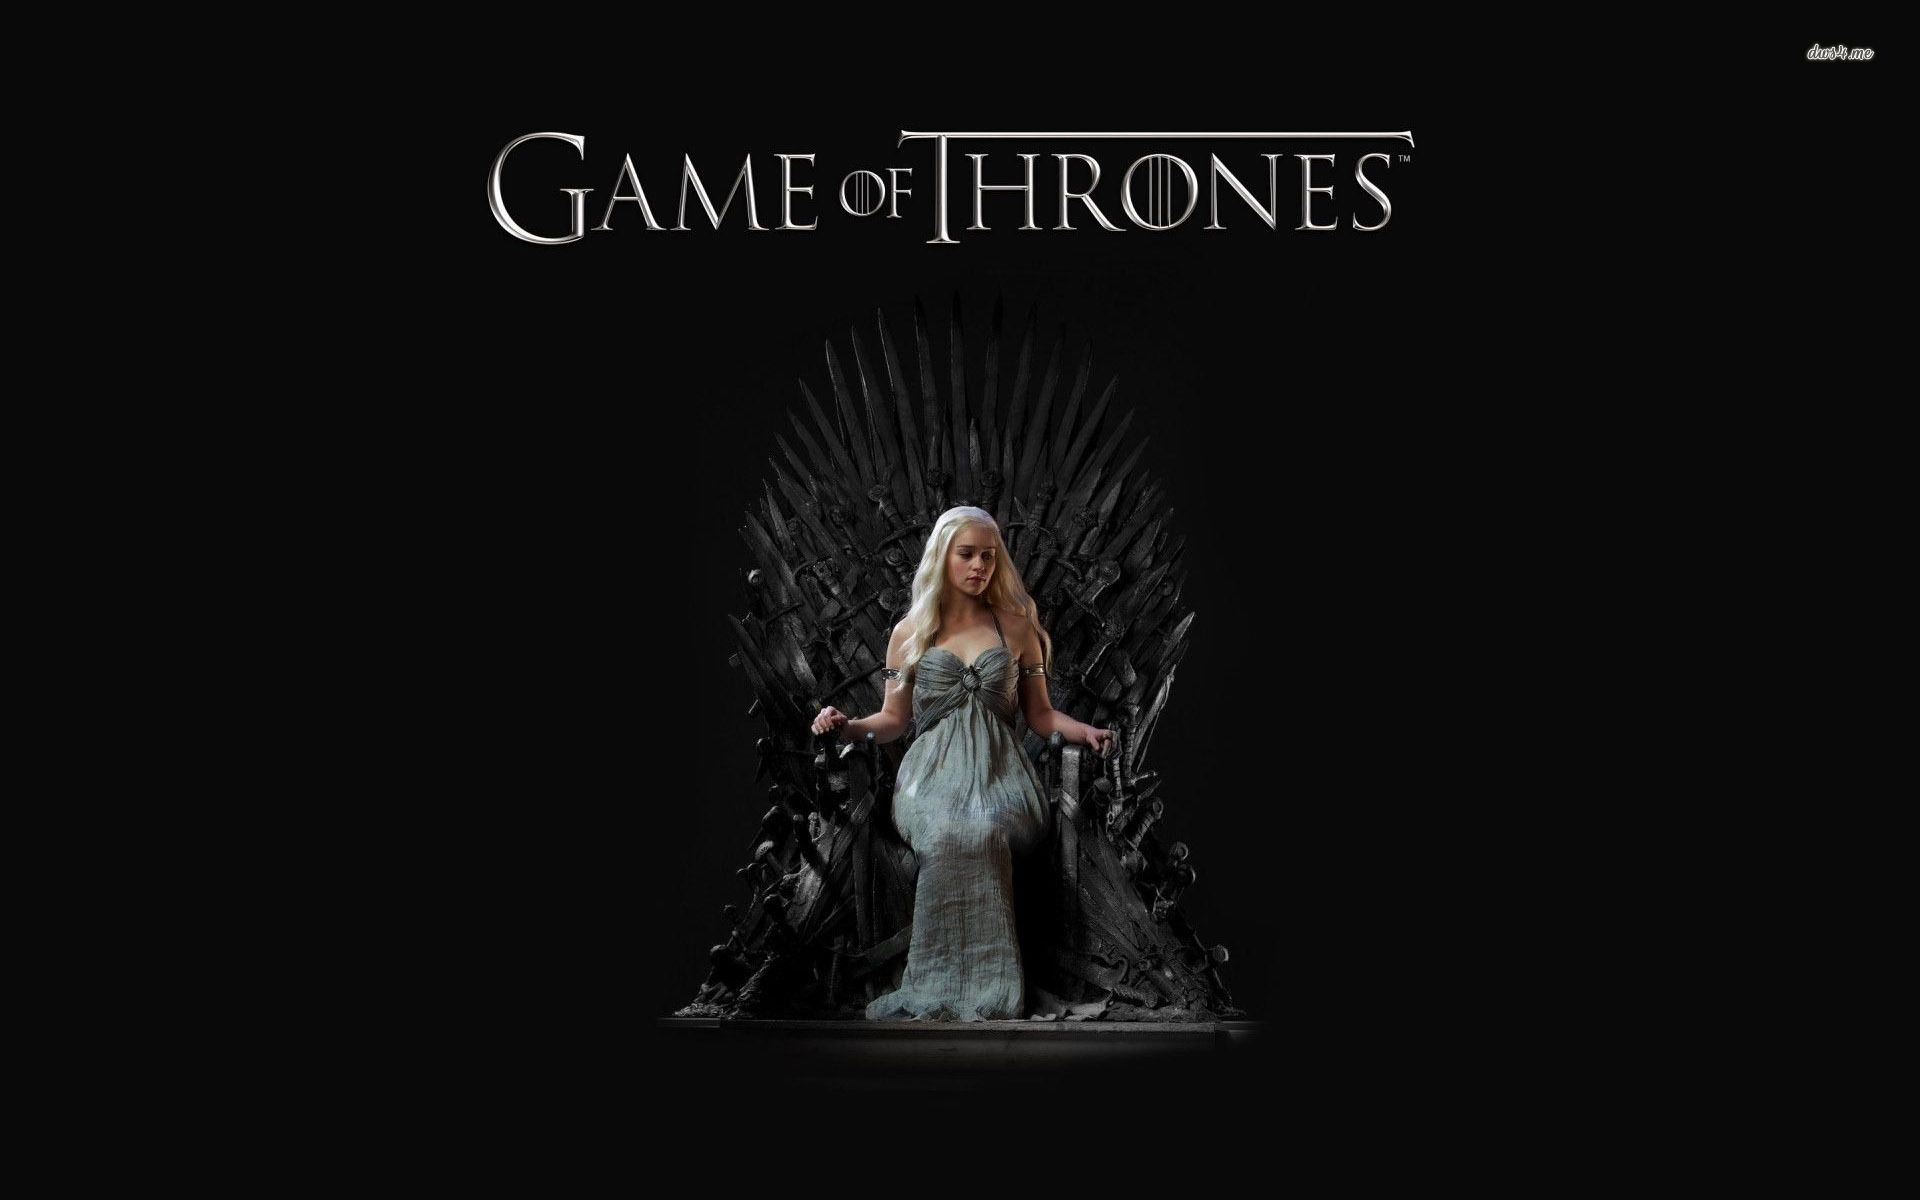 Daenerys Targaryen Game Of Thrones Hd Wallpaper Juego De Tronos Game Of Thrones Wallpaper Game Of Thrones